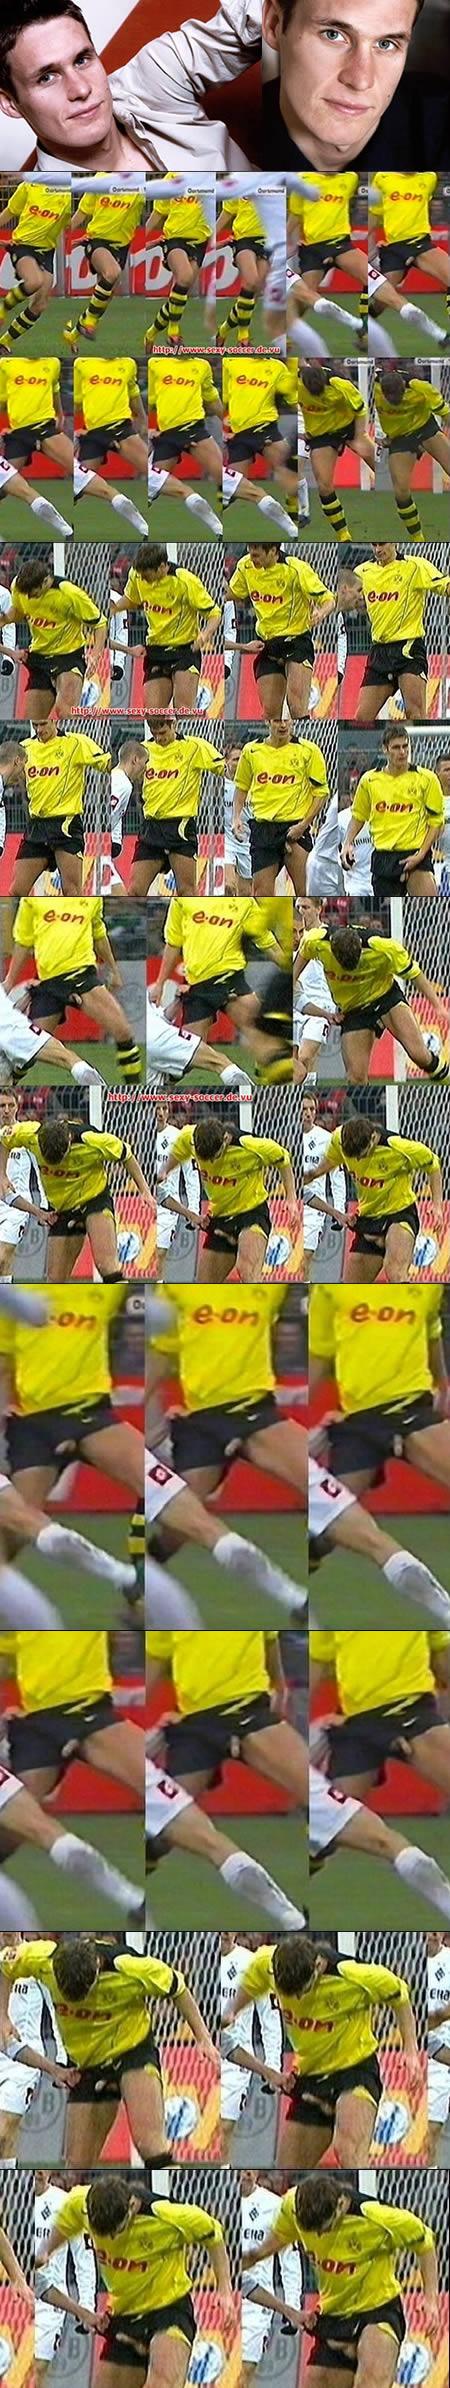 Sebastian Kehl's dick flip!